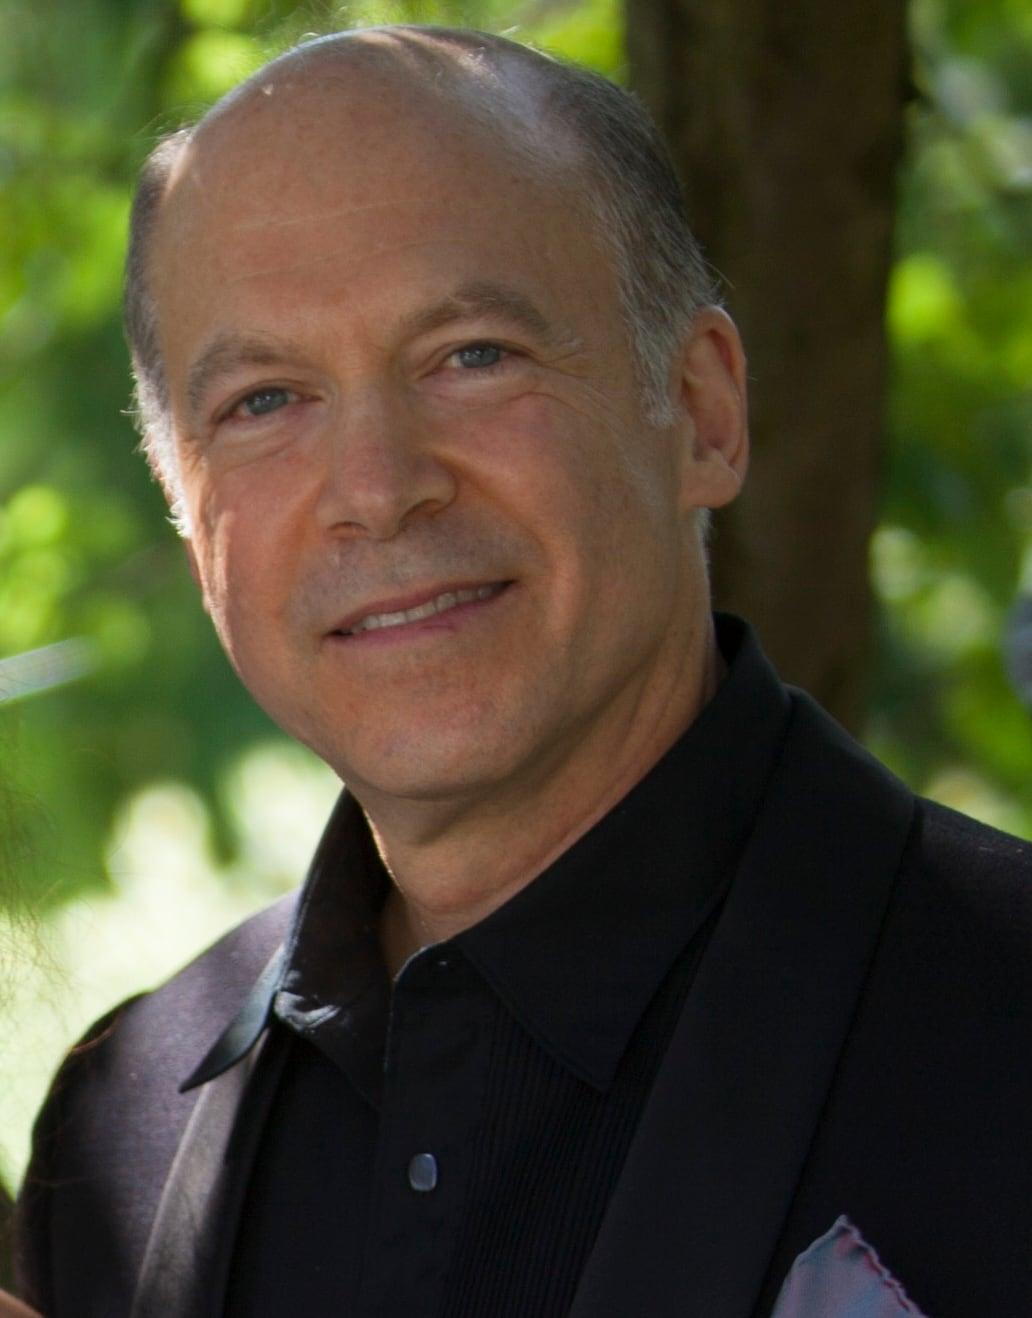 Dr. Michael D Steiner MD